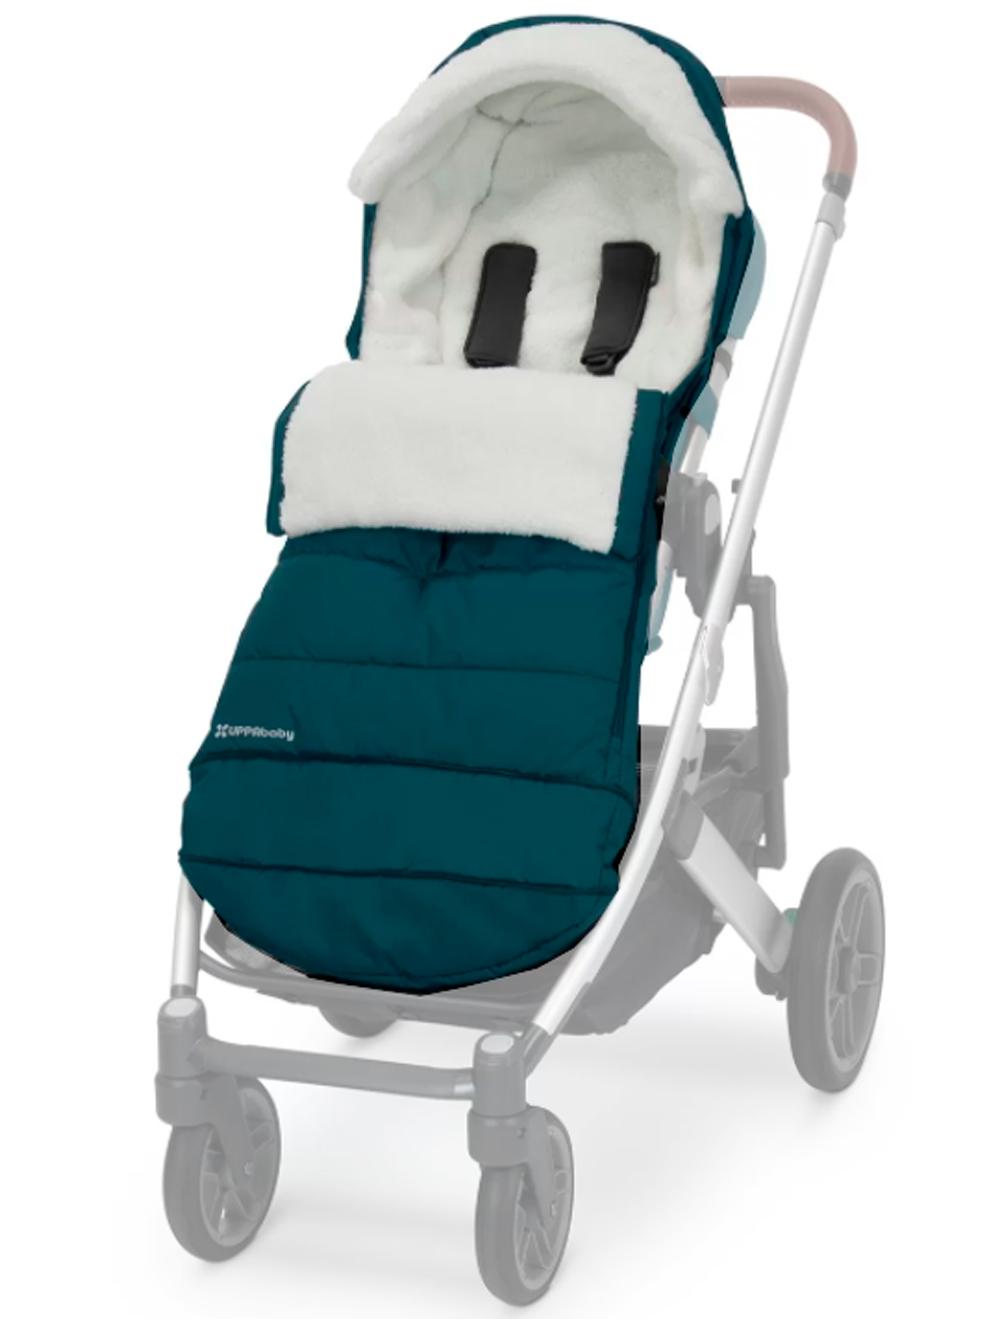 Купить 2267848, Аксессуар для коляски UPPAbaby, синий, 3984528080034